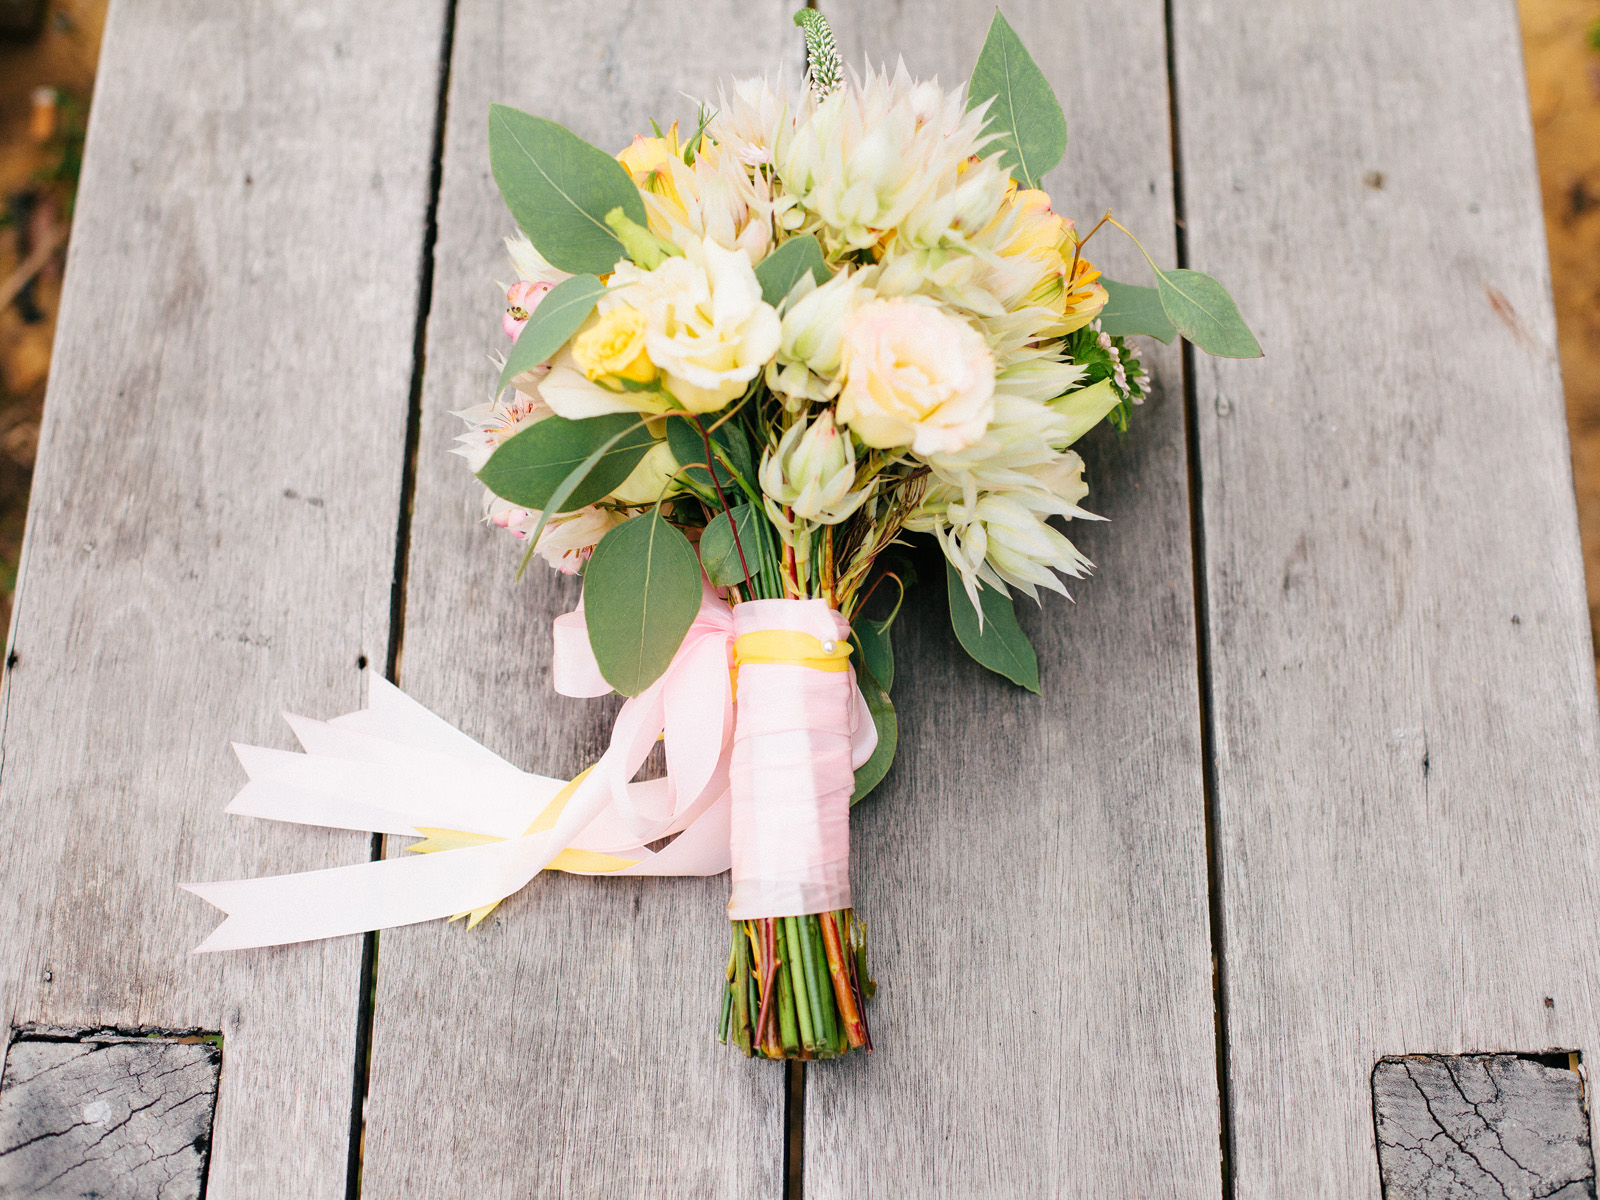 singapore-wedding-travel-photographer-faith-alvin-wedding-wmt-36.jpg